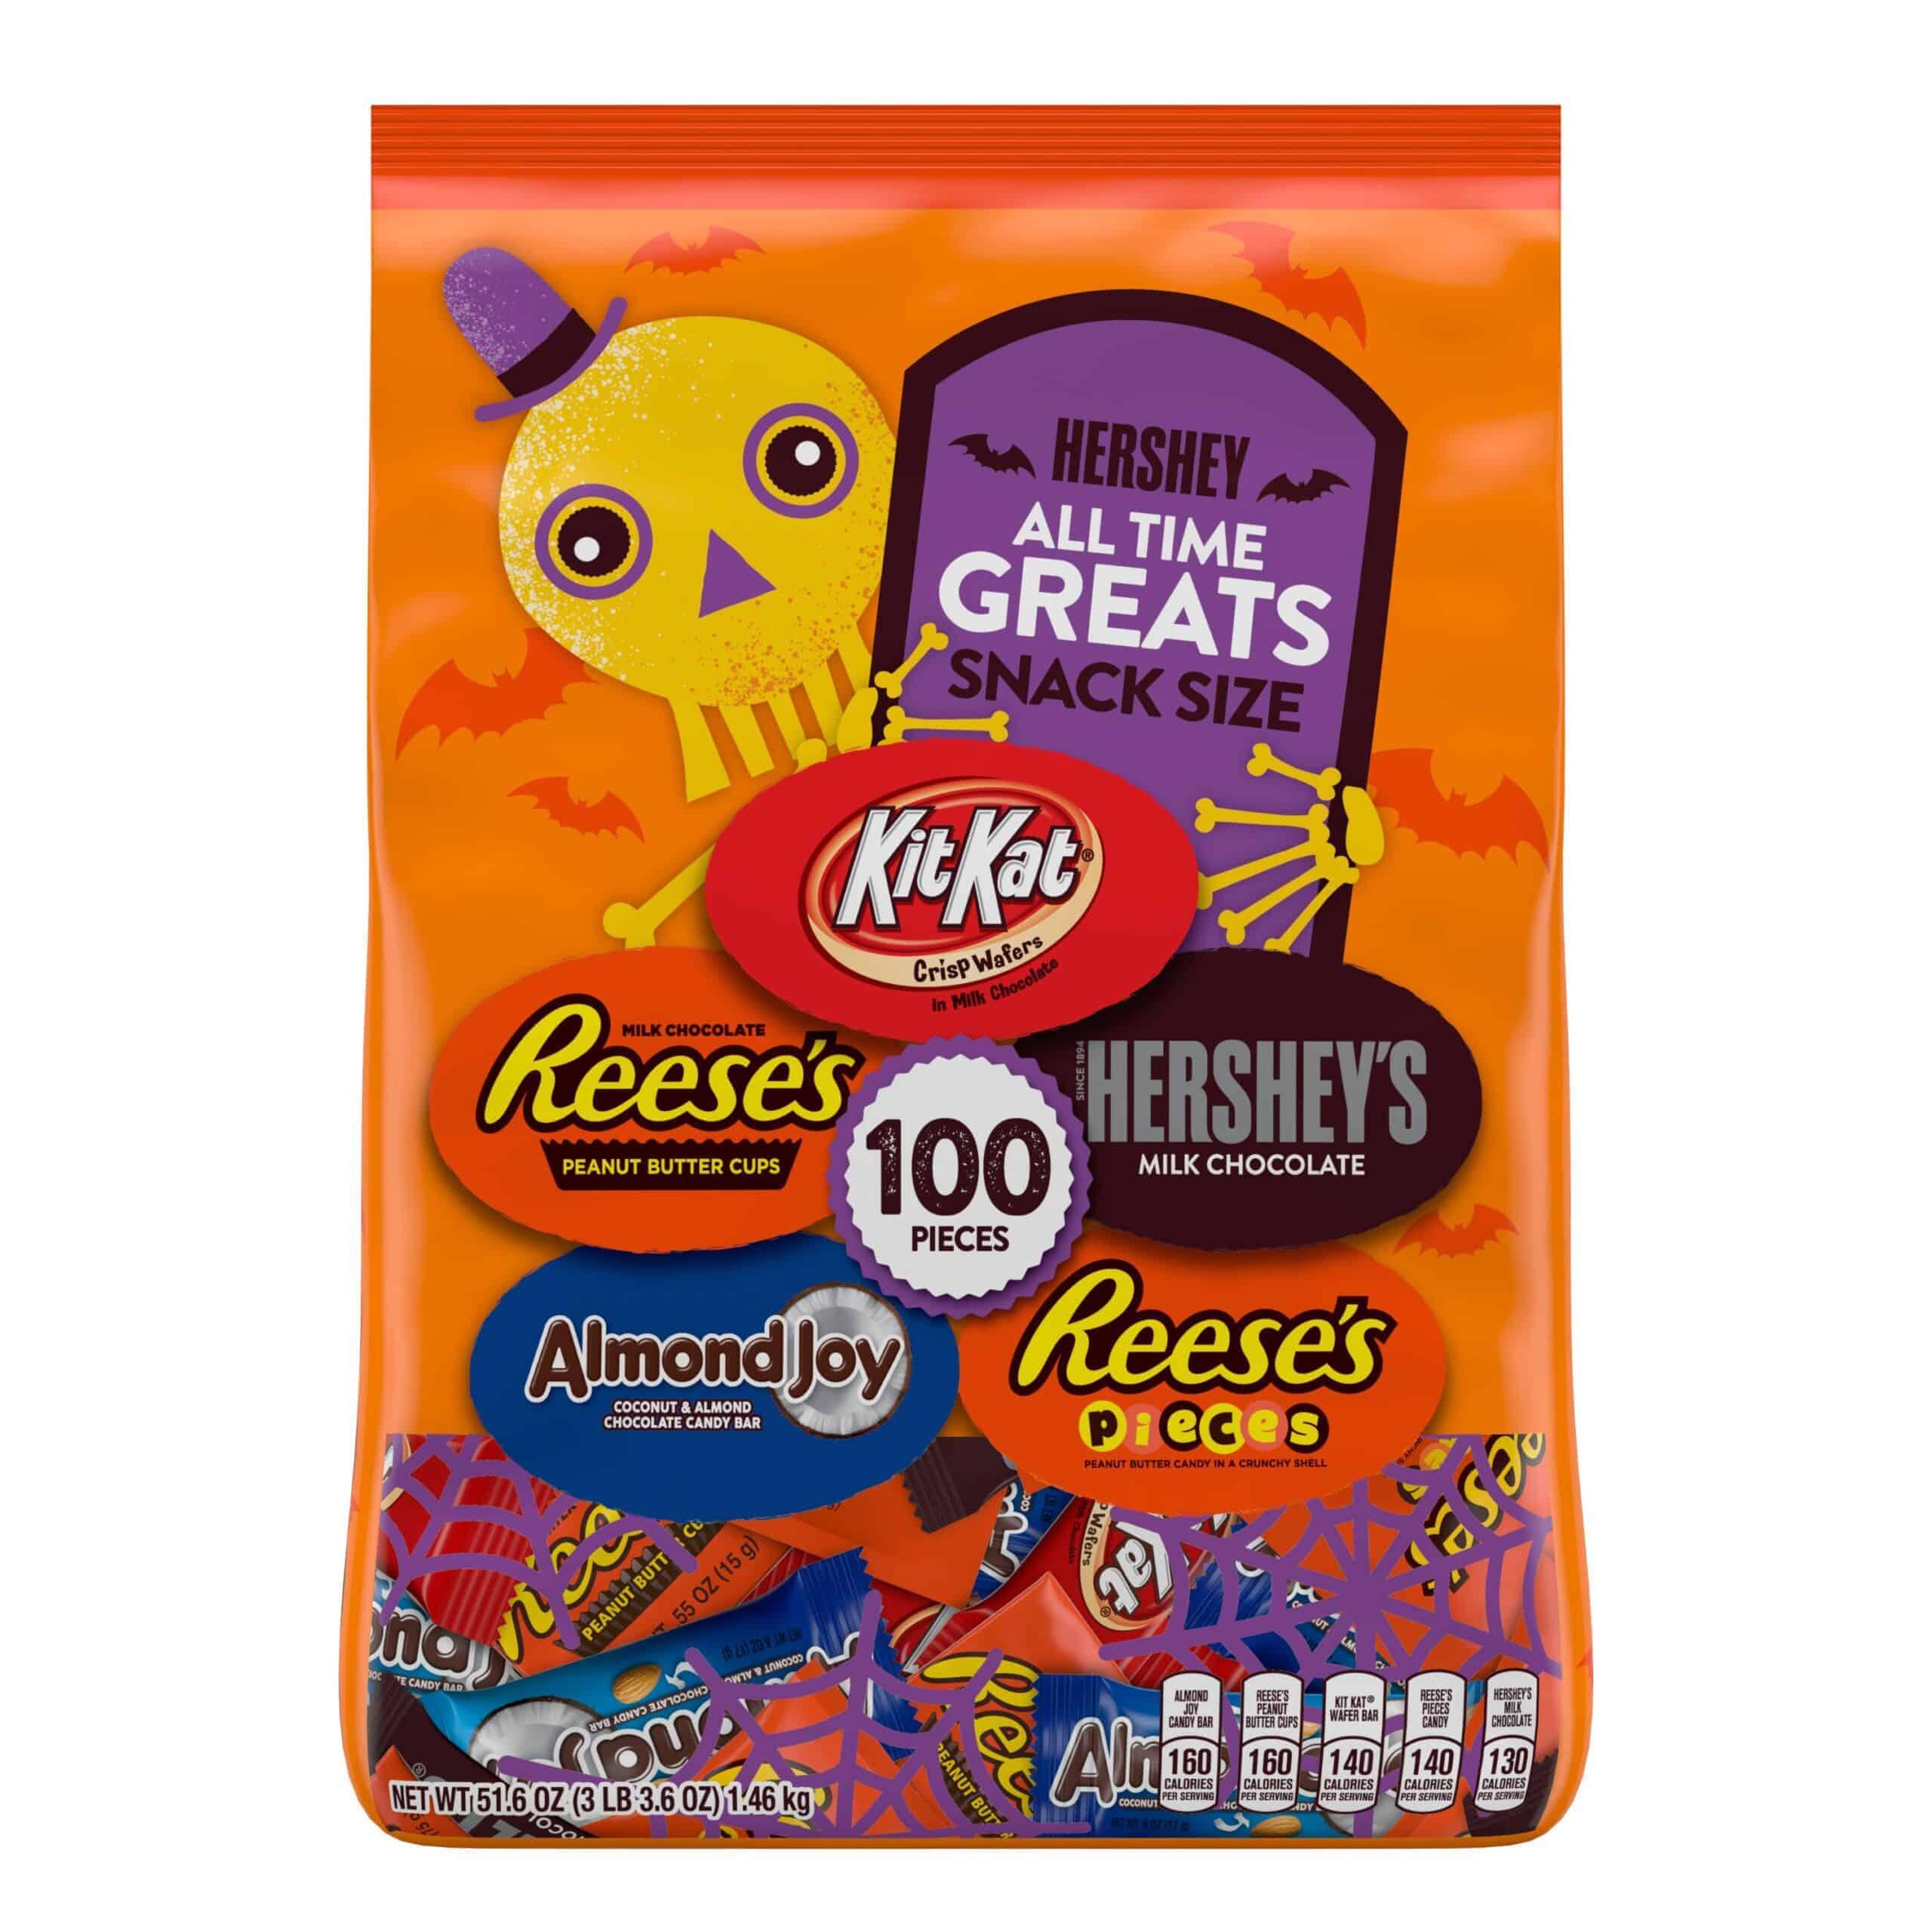 Hershey Halloween Candy Assortment - 100 Count